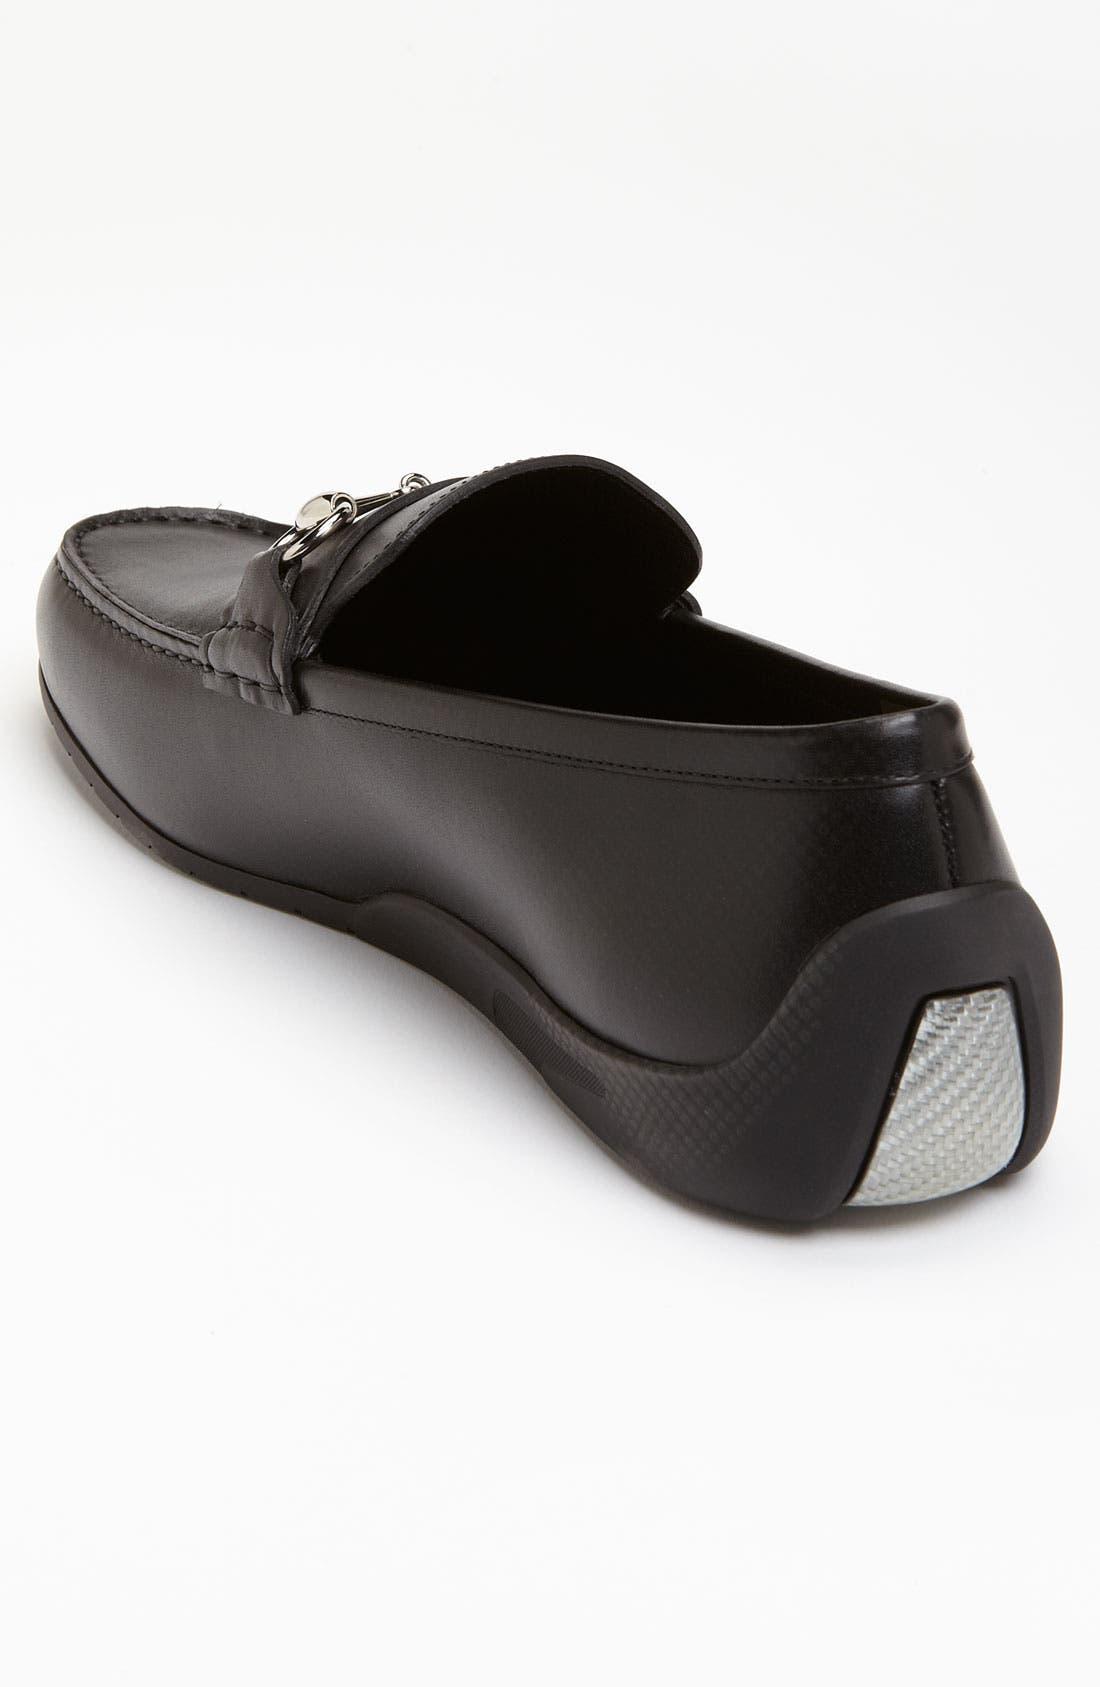 Alternate Image 2  - Gucci 'Silverstone' Moccasin Loafer